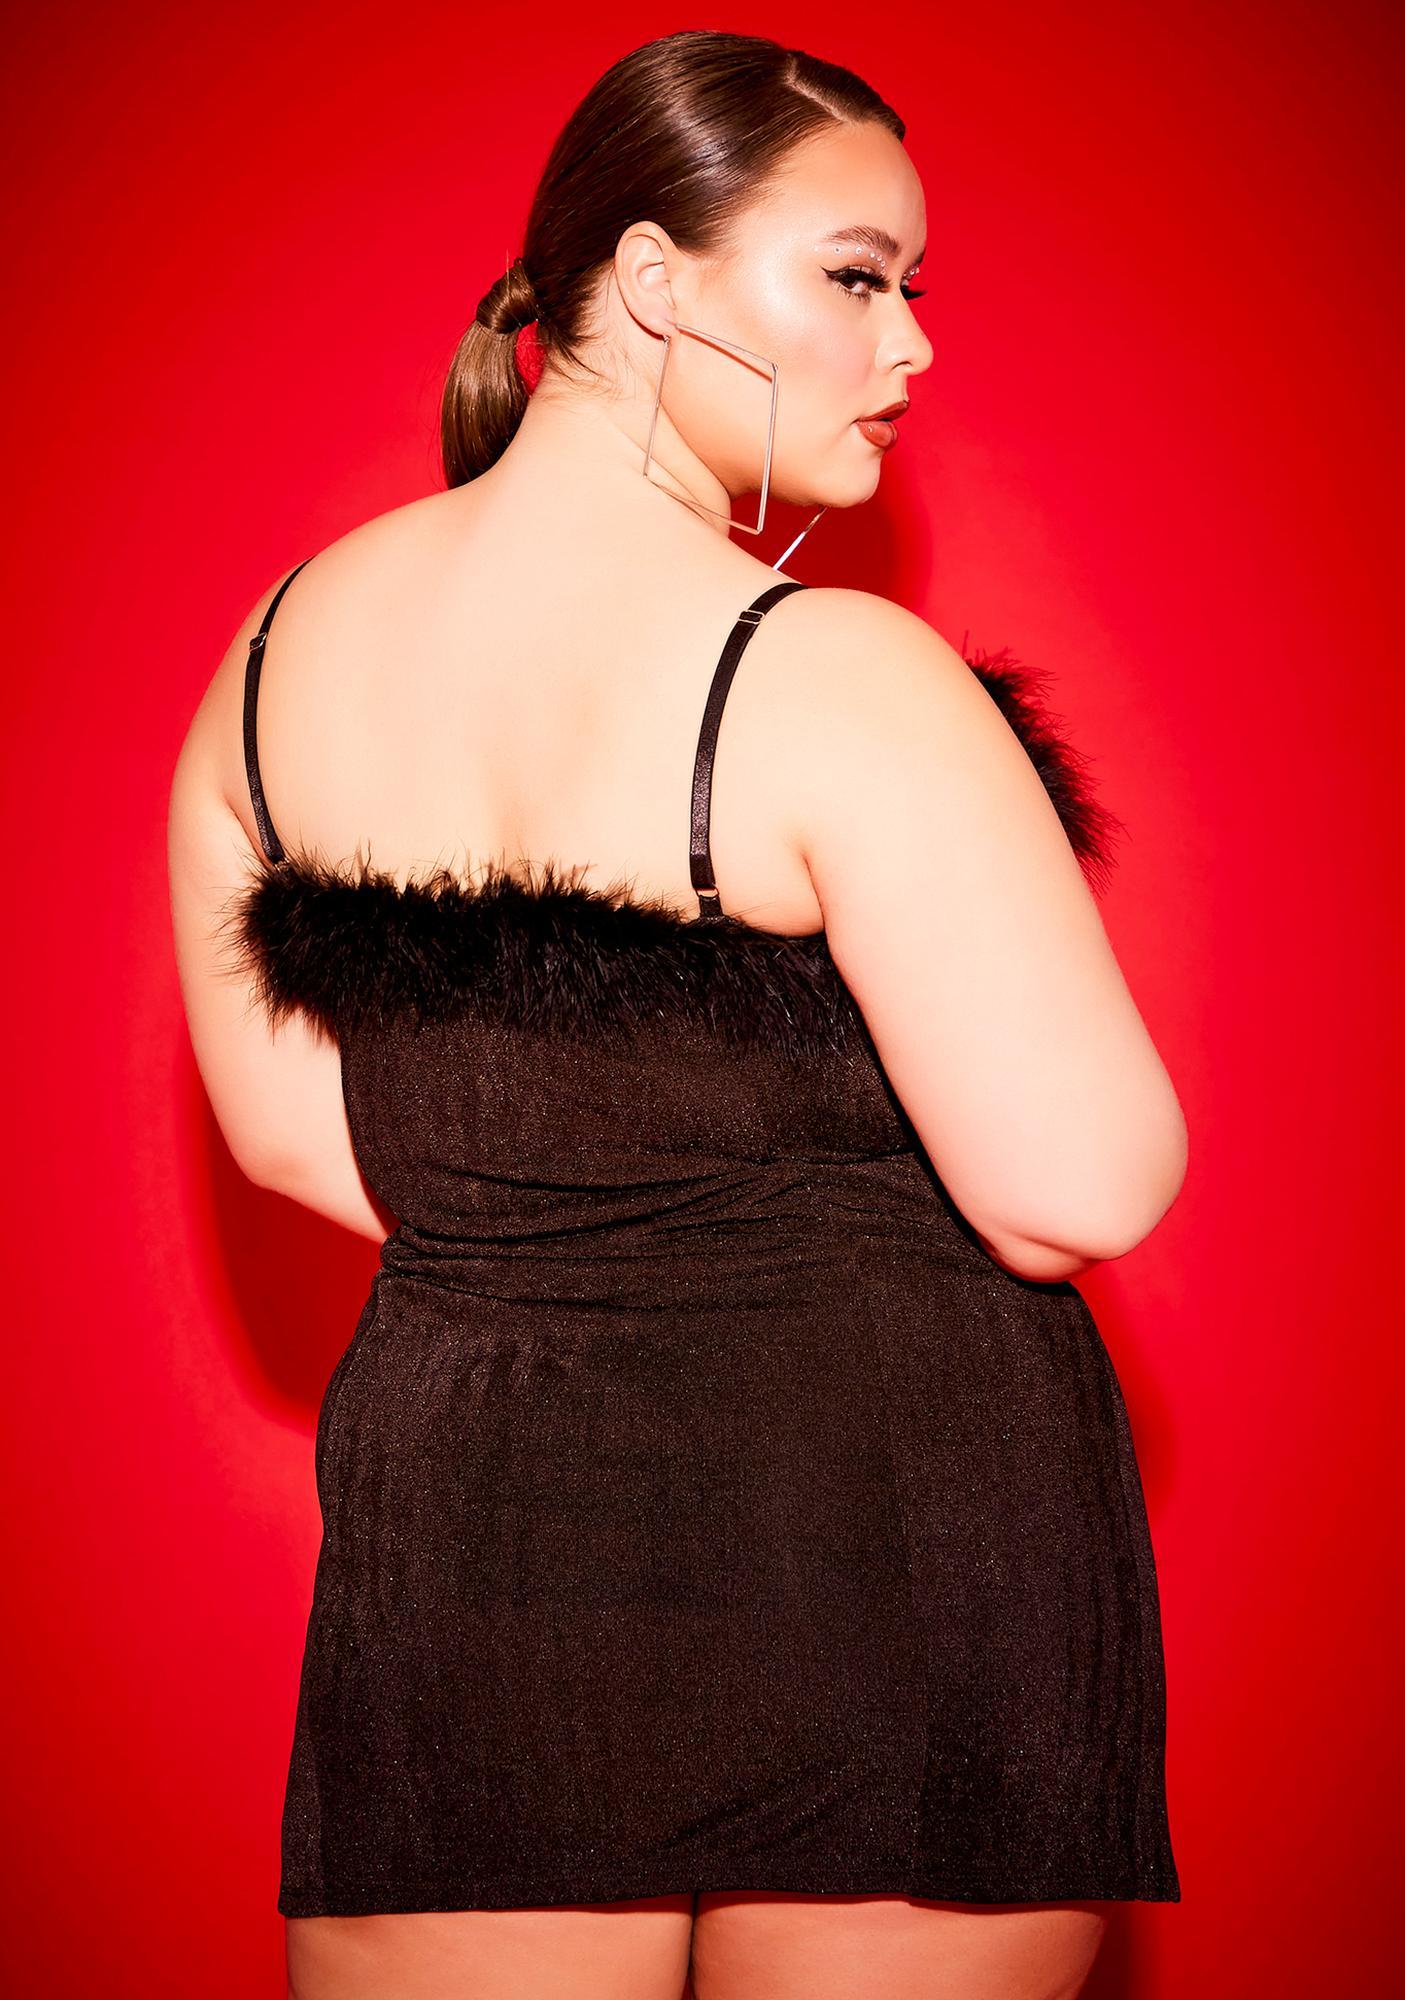 Poster Grl Miss Free Smoke Babygirl Boa Mini Dress